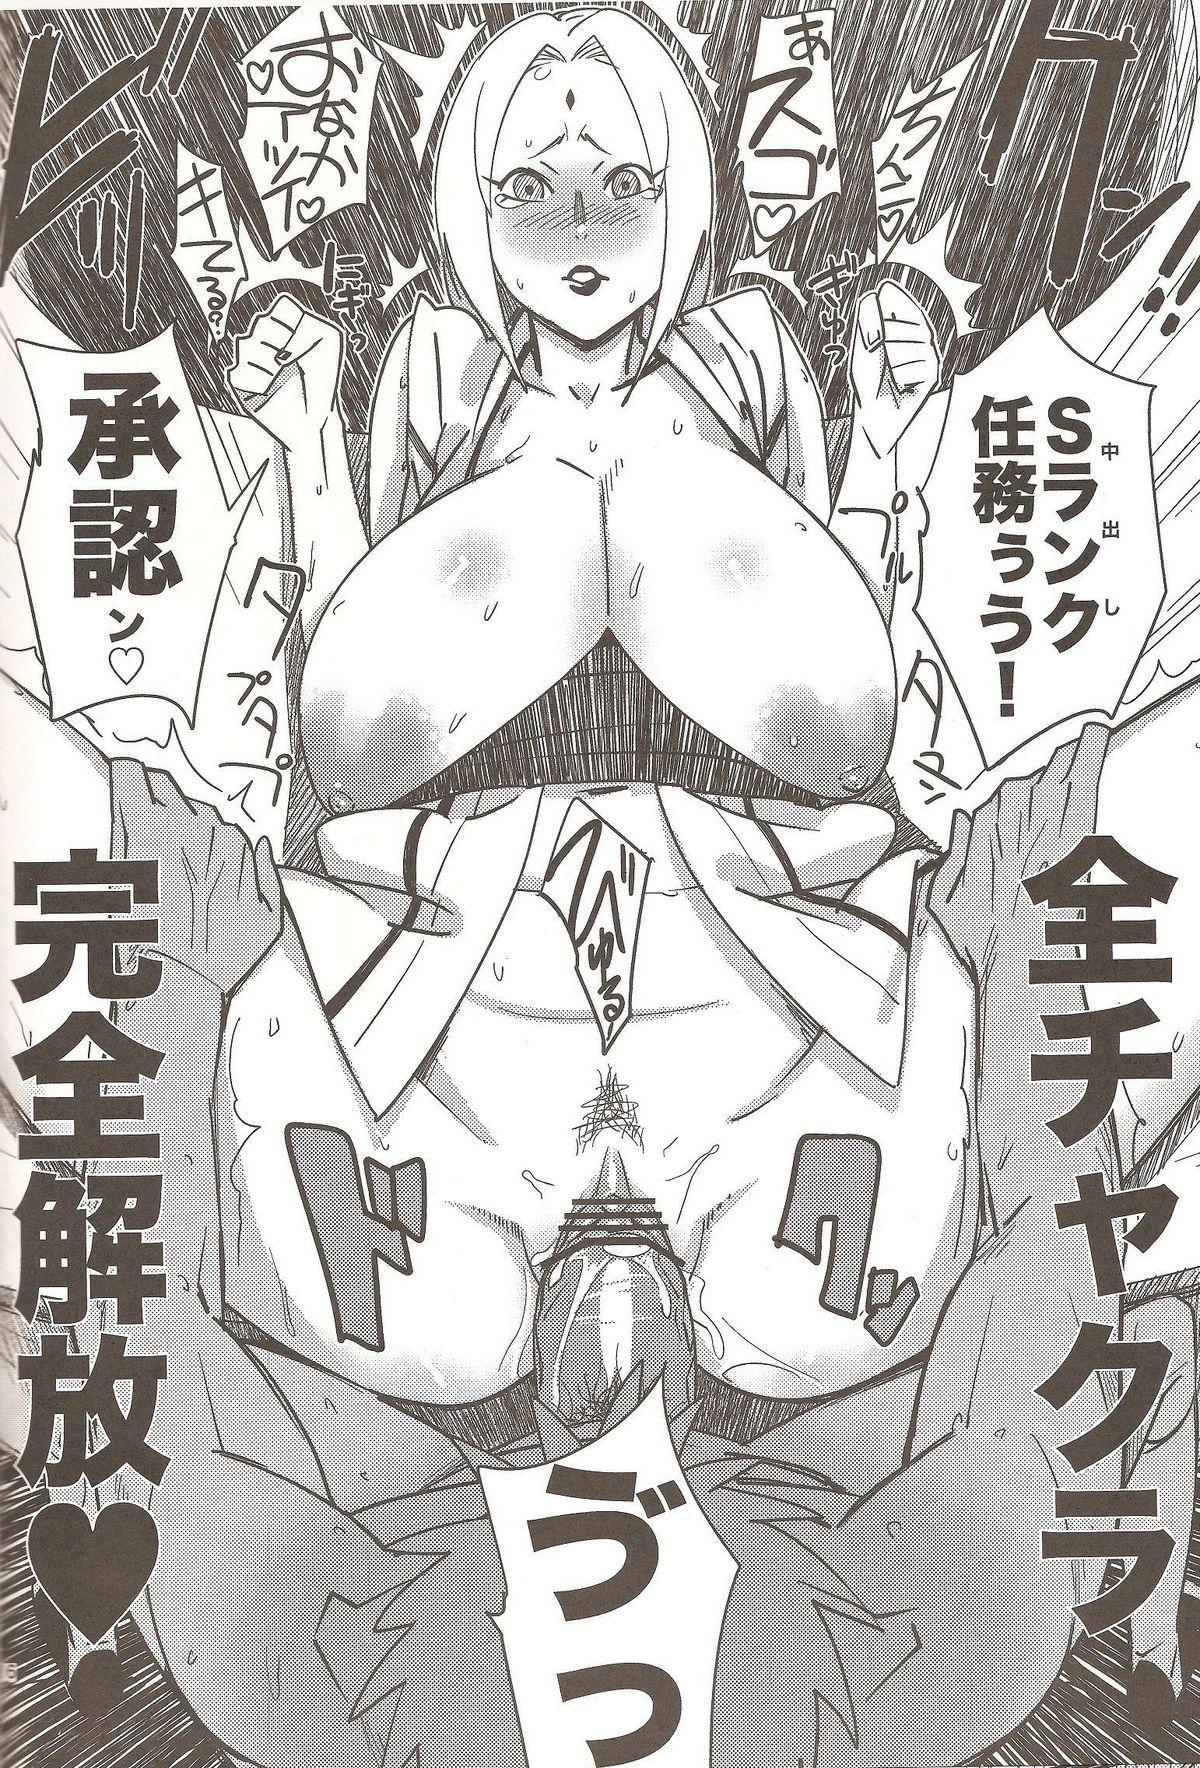 AbRAdEli kAMiTAbA No. 01 Chichikage Hanjouki 14